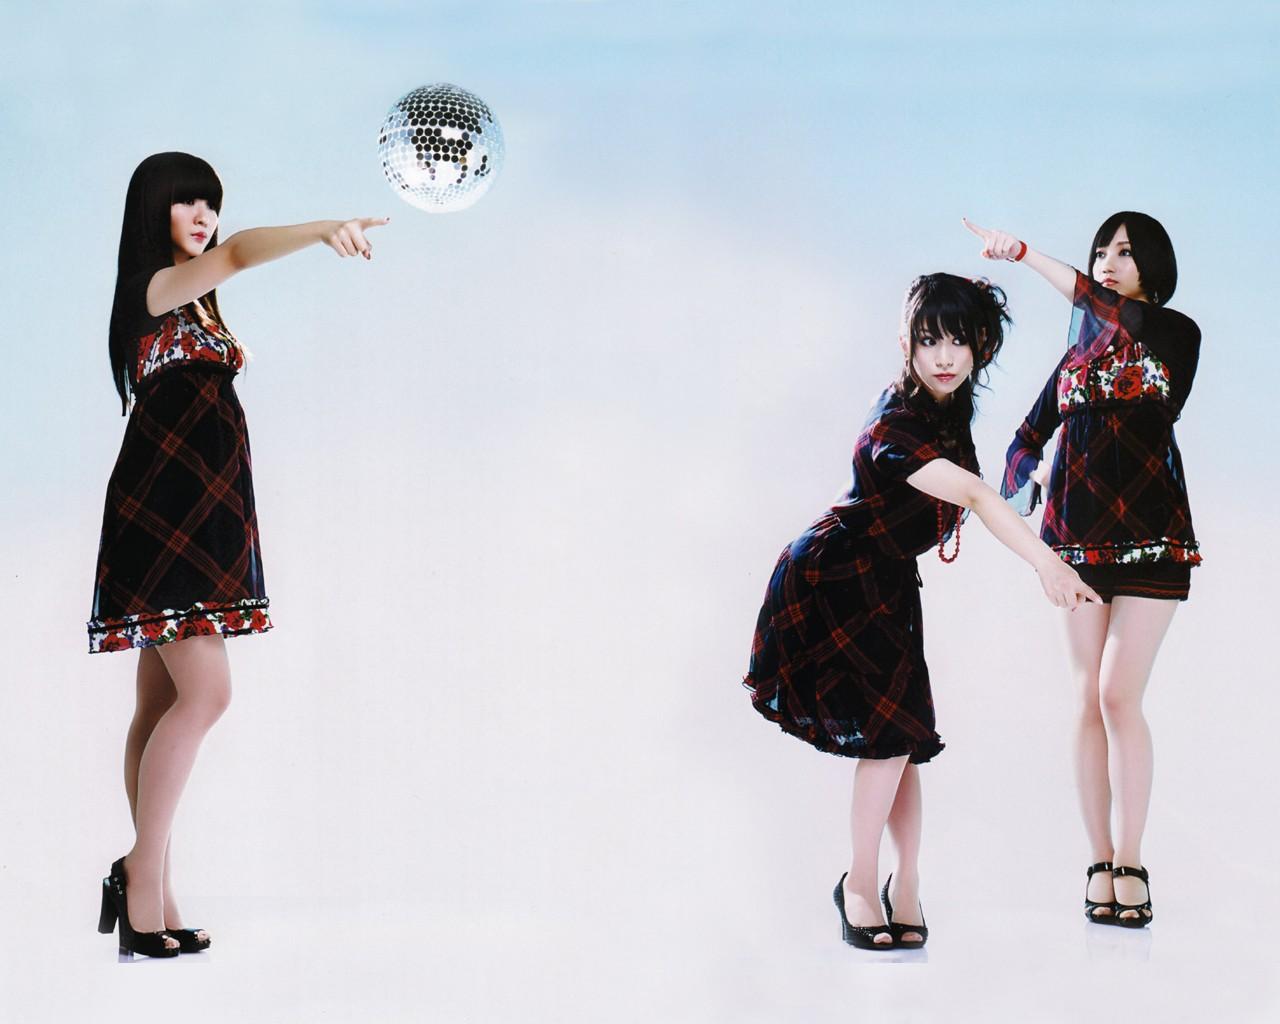 2fca9fb2d9eb kjole mønster mode forår Parfume Akan kashiyuka Nocchi tøj kvinde design  kostume Photo shoot